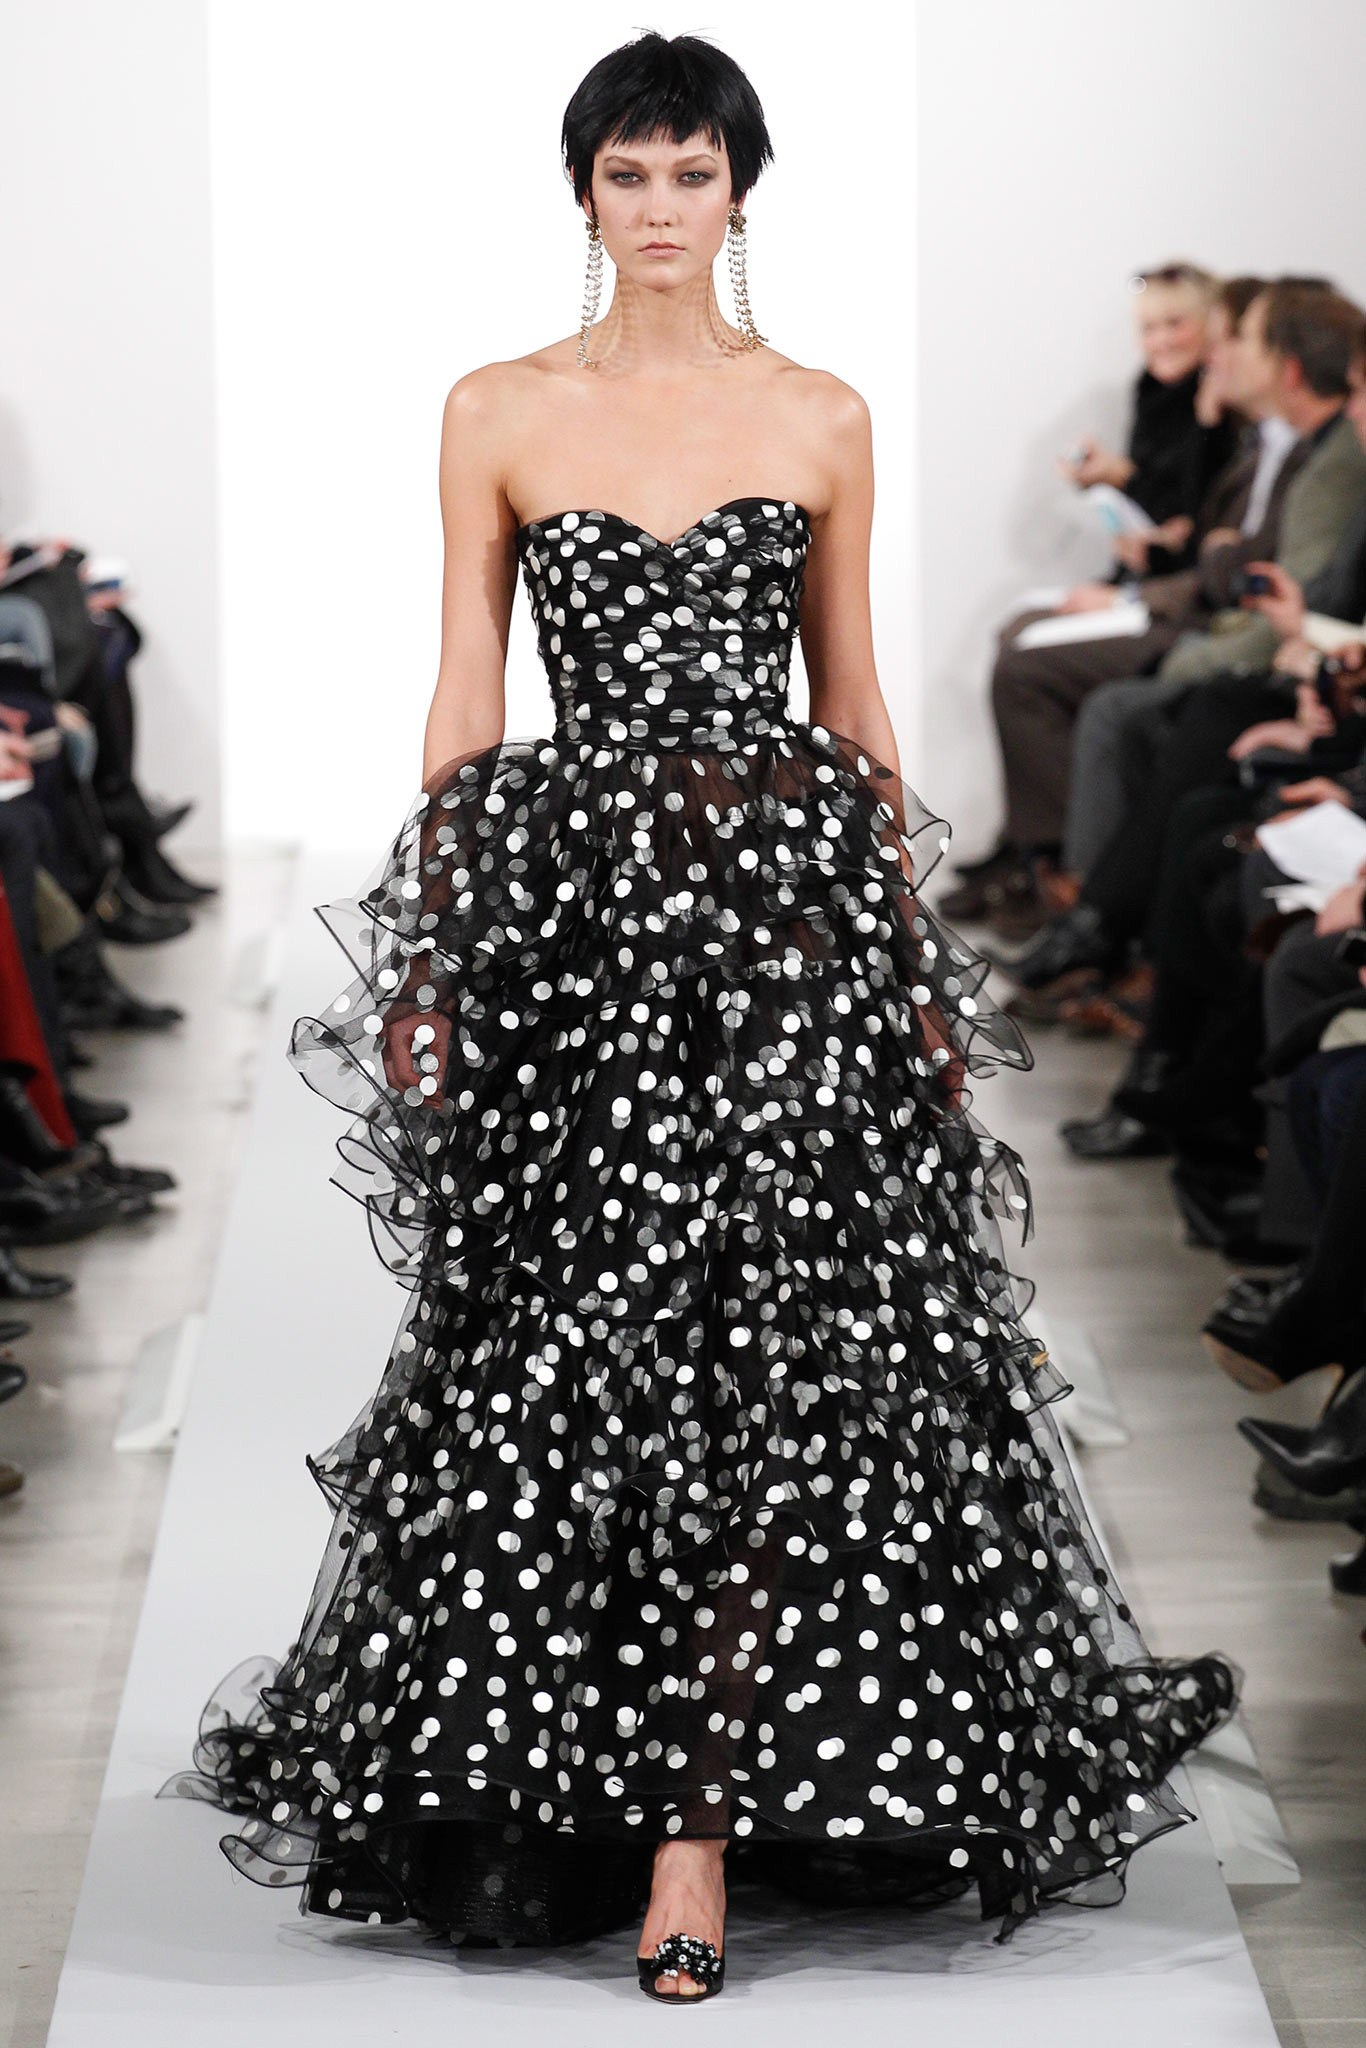 trend-flamenco-polka-dots-55